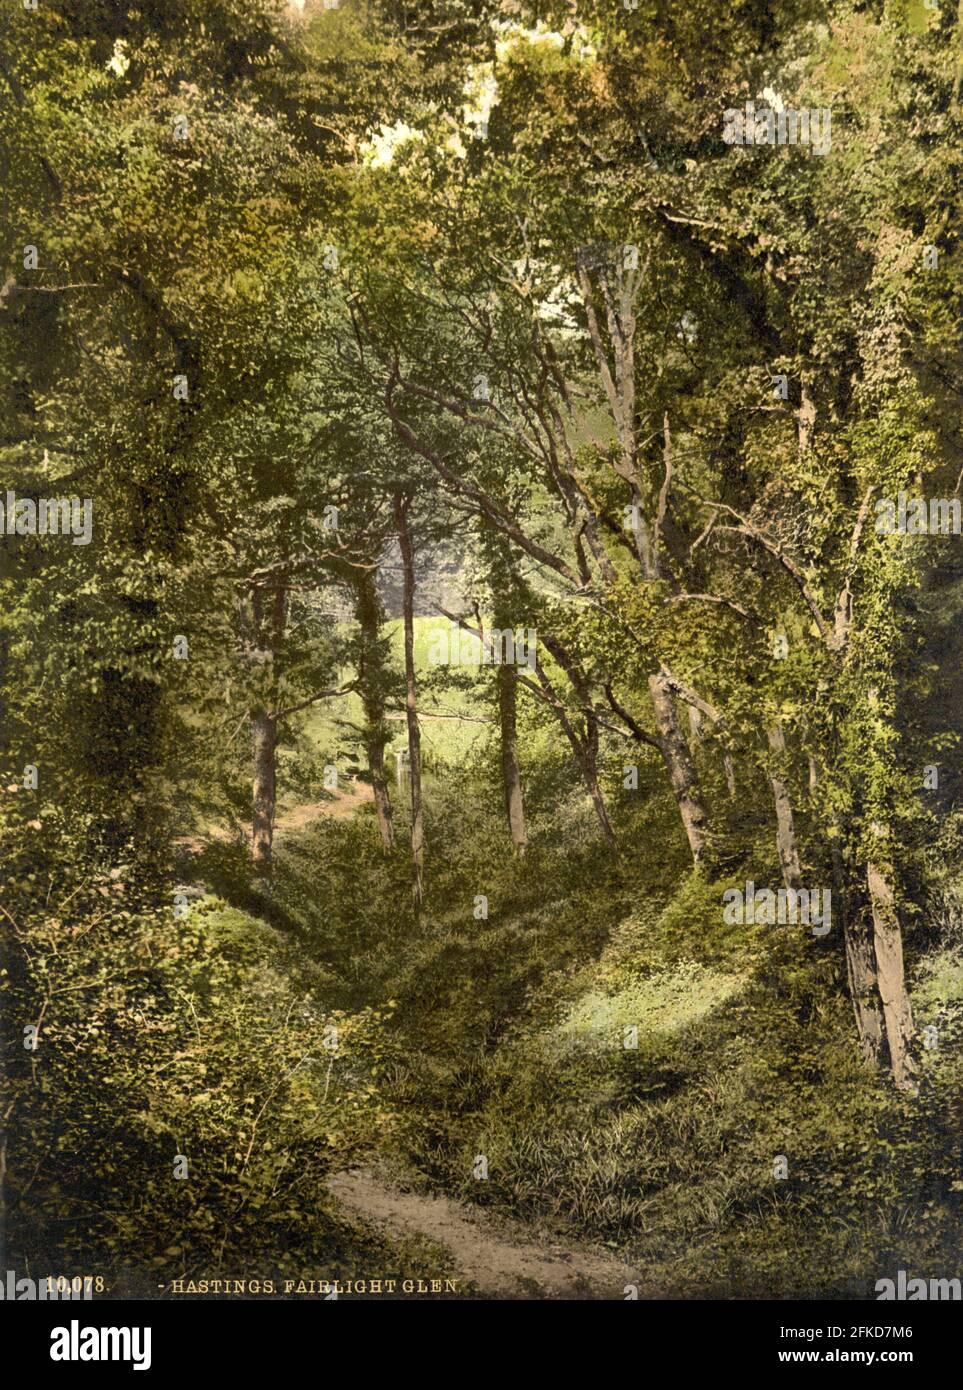 Fairlight Glen, Hastings, Sussex vers 1890-1900 Banque D'Images